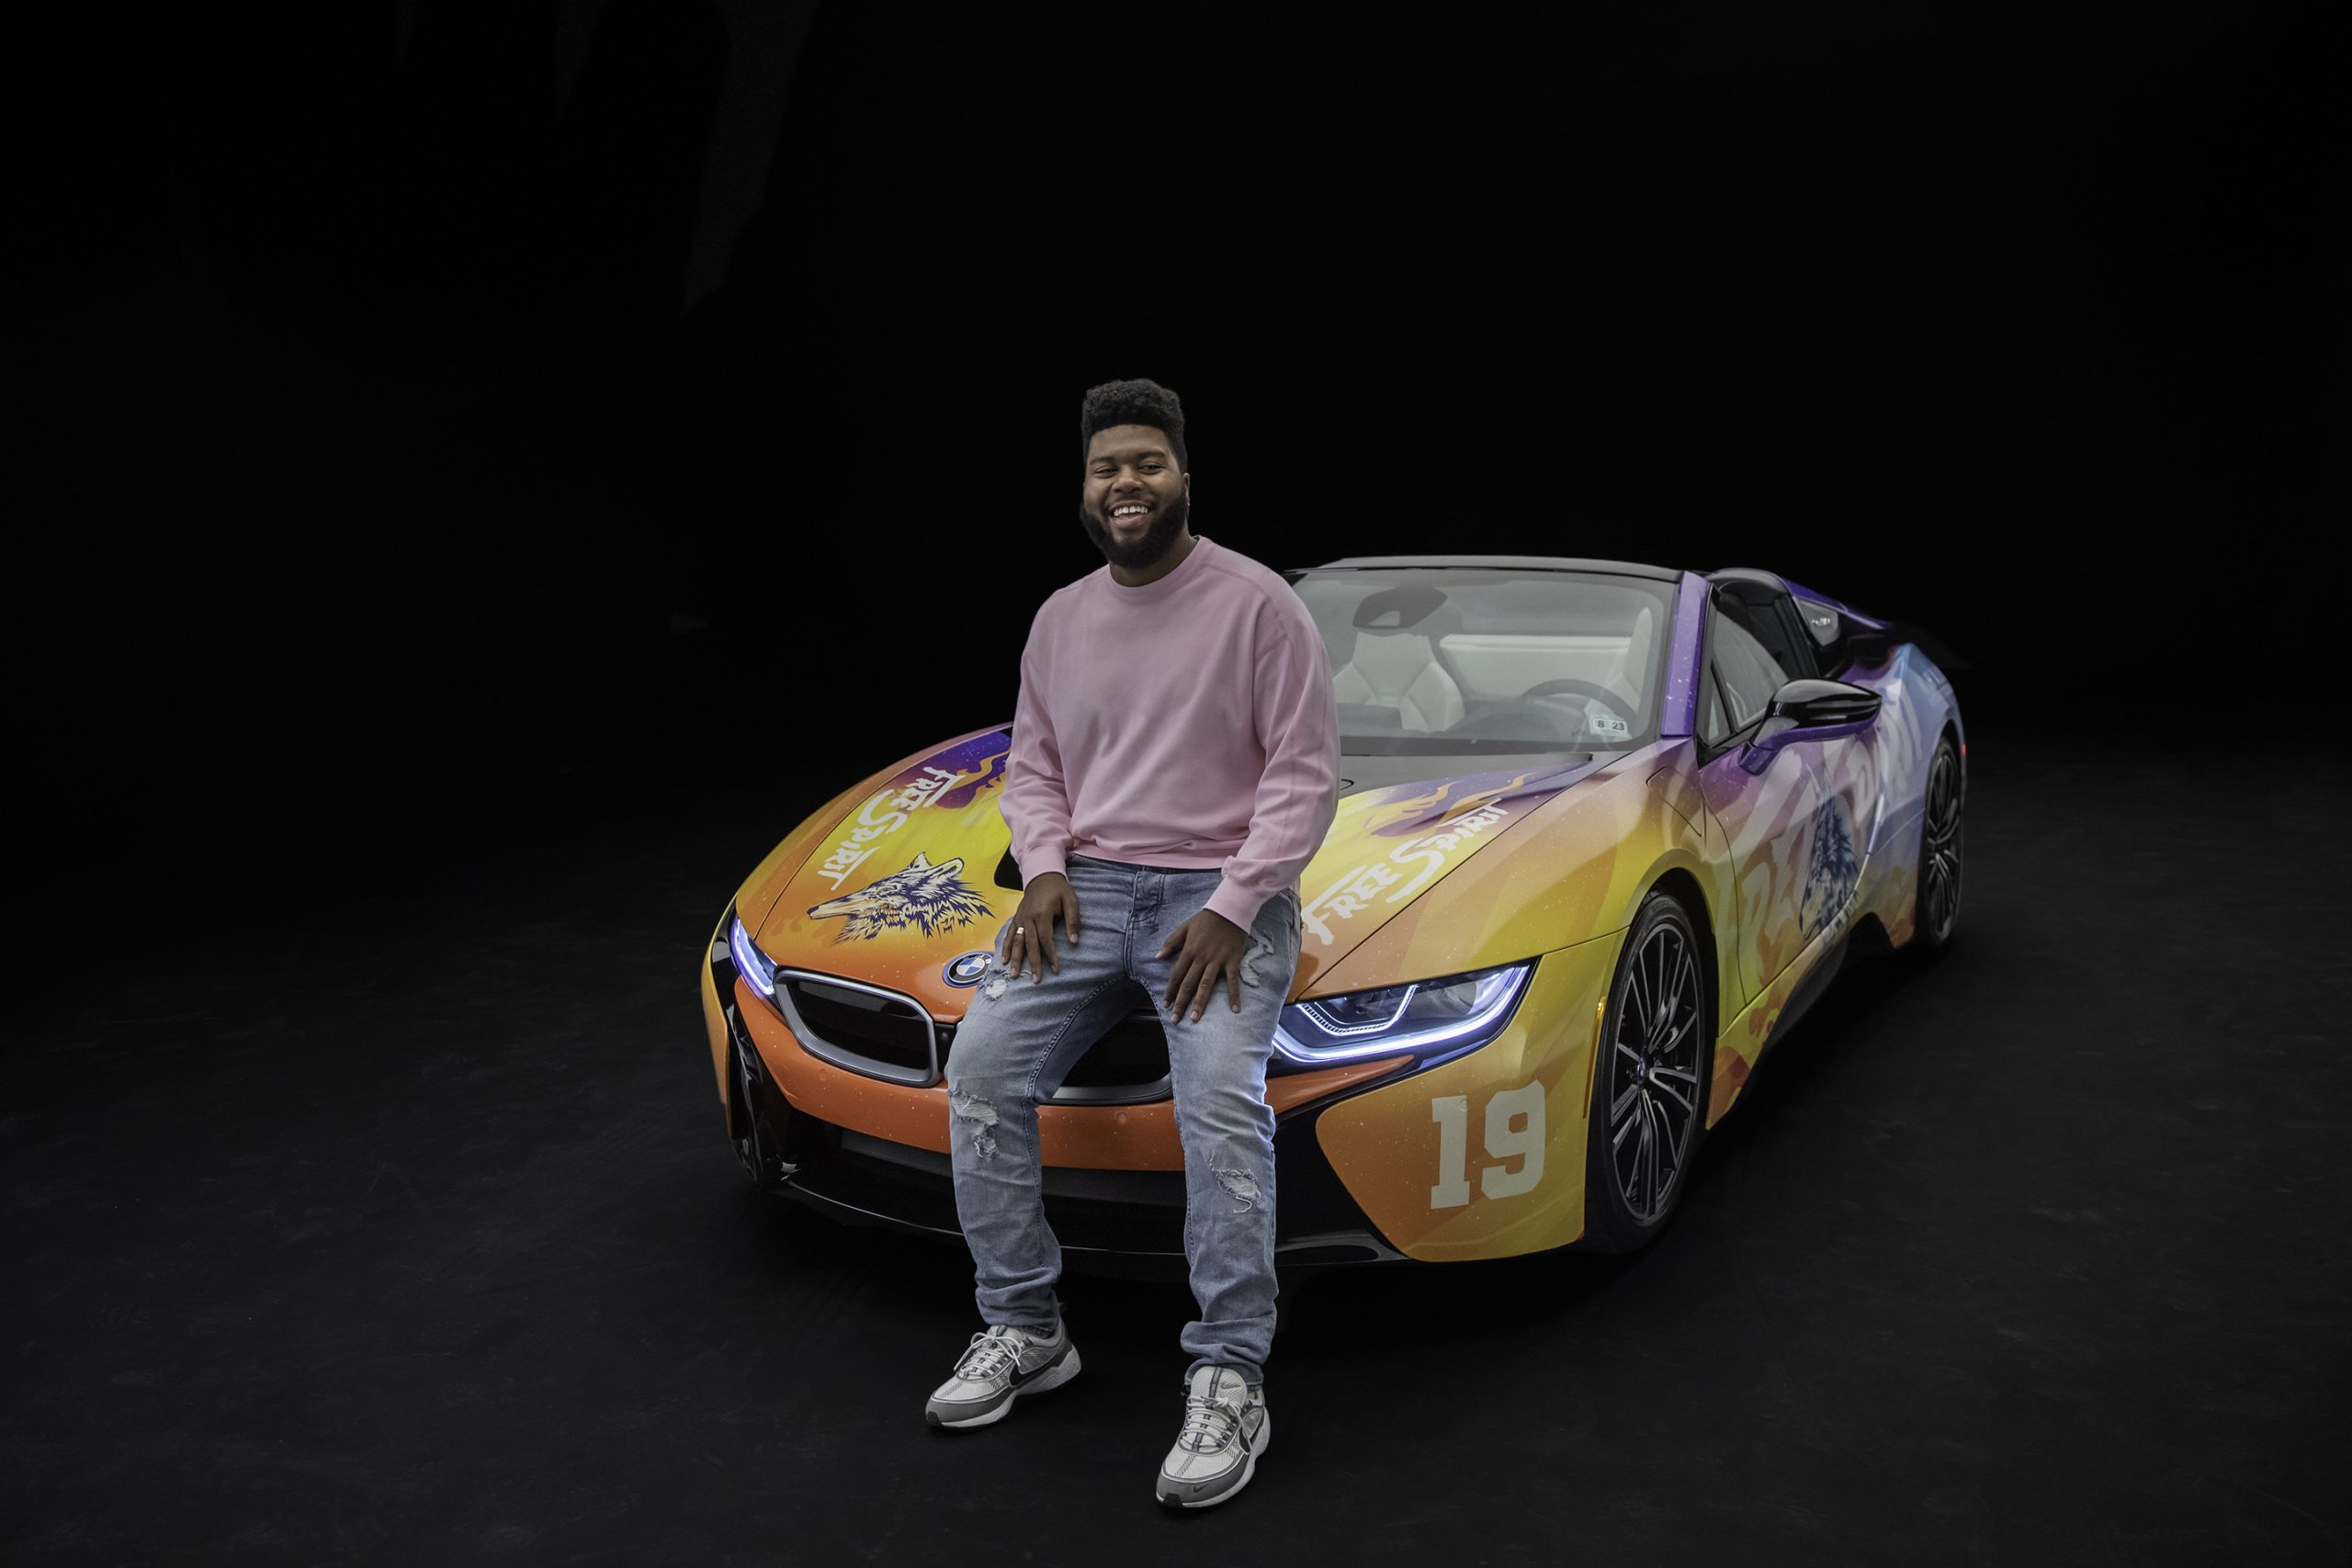 BMW Road to Coachella 2019